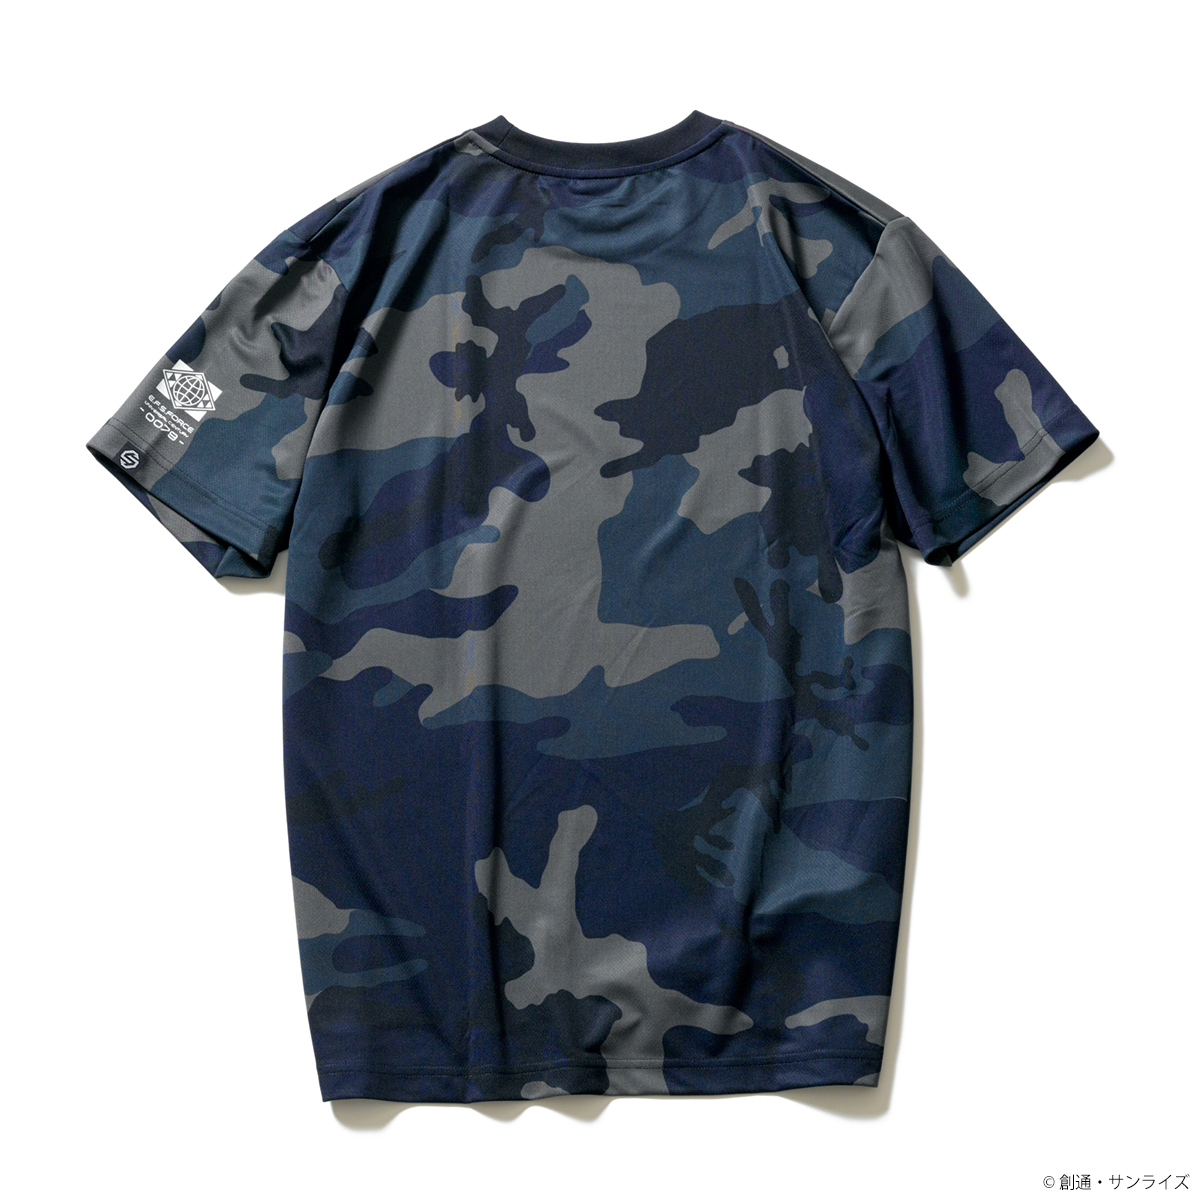 STRICT-G 『機動戦士ガンダム』 ドライカモフラージュTシャツ E.F.S.F.